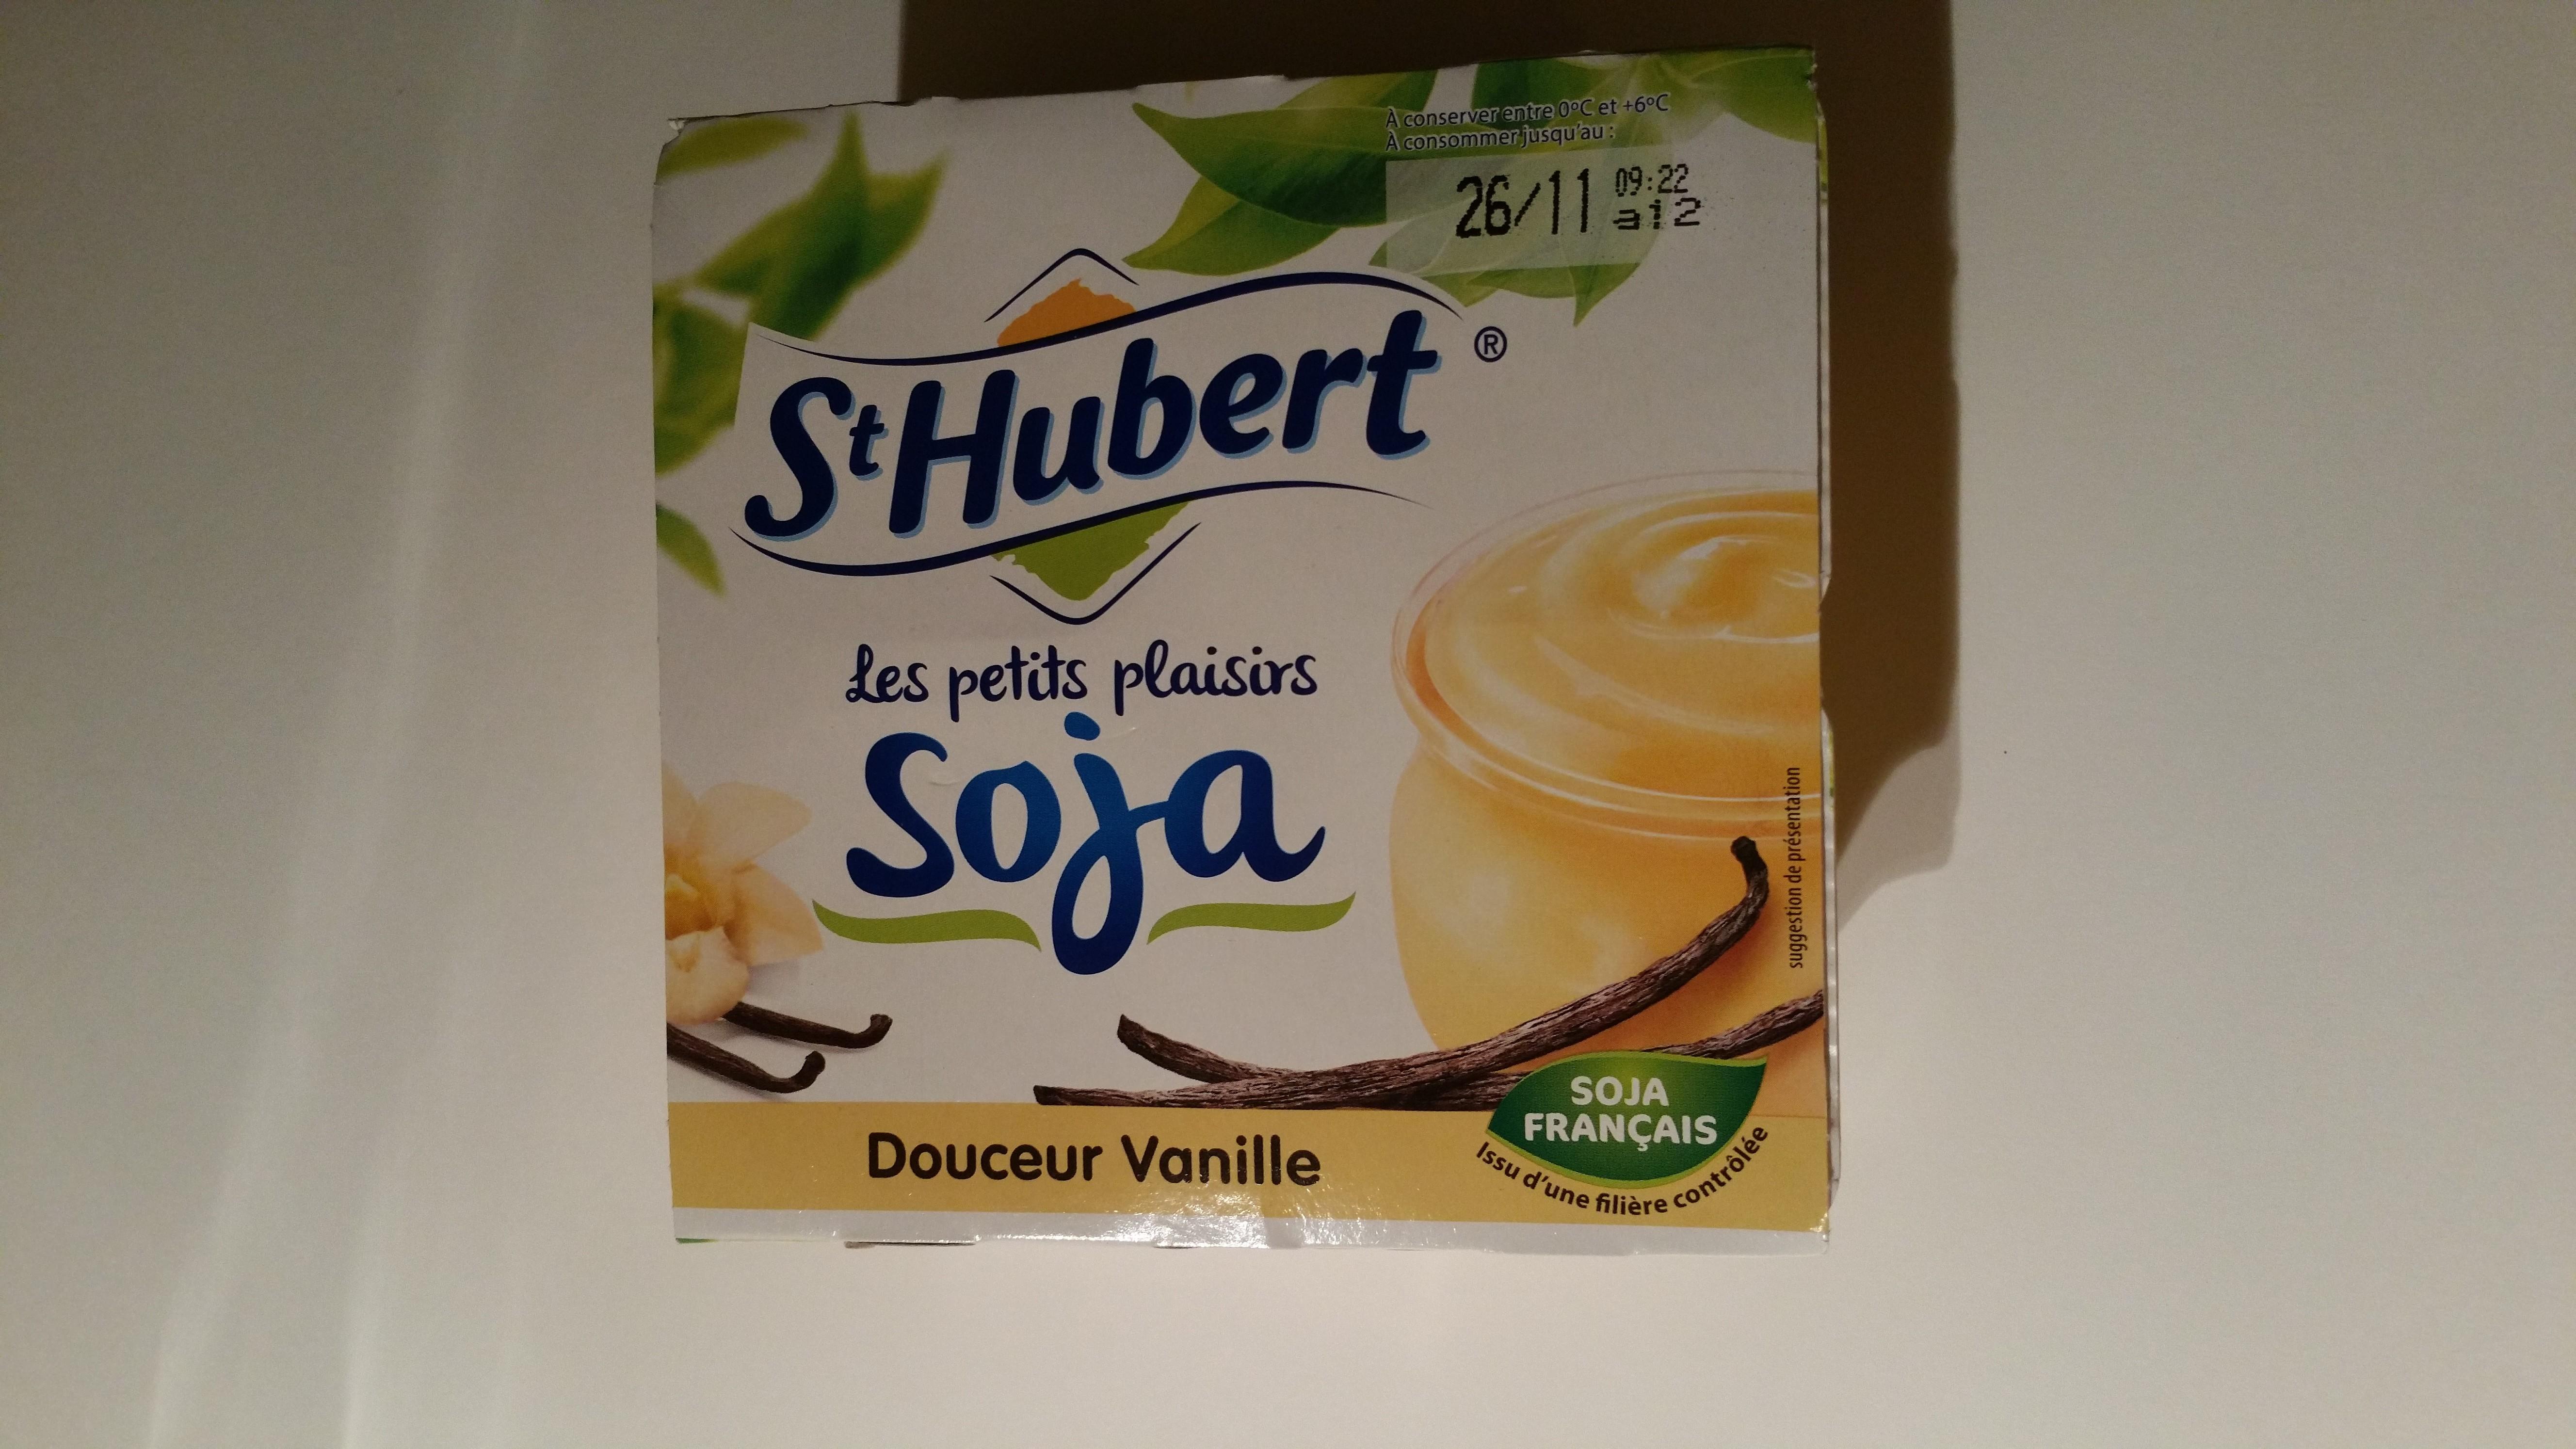 St-Hubert-Petits-Plaisirs-Soja®-Douceur-Vanille - Les-Petits-Plaisirs-Soja®-Douceur-Vanille-4.jpg